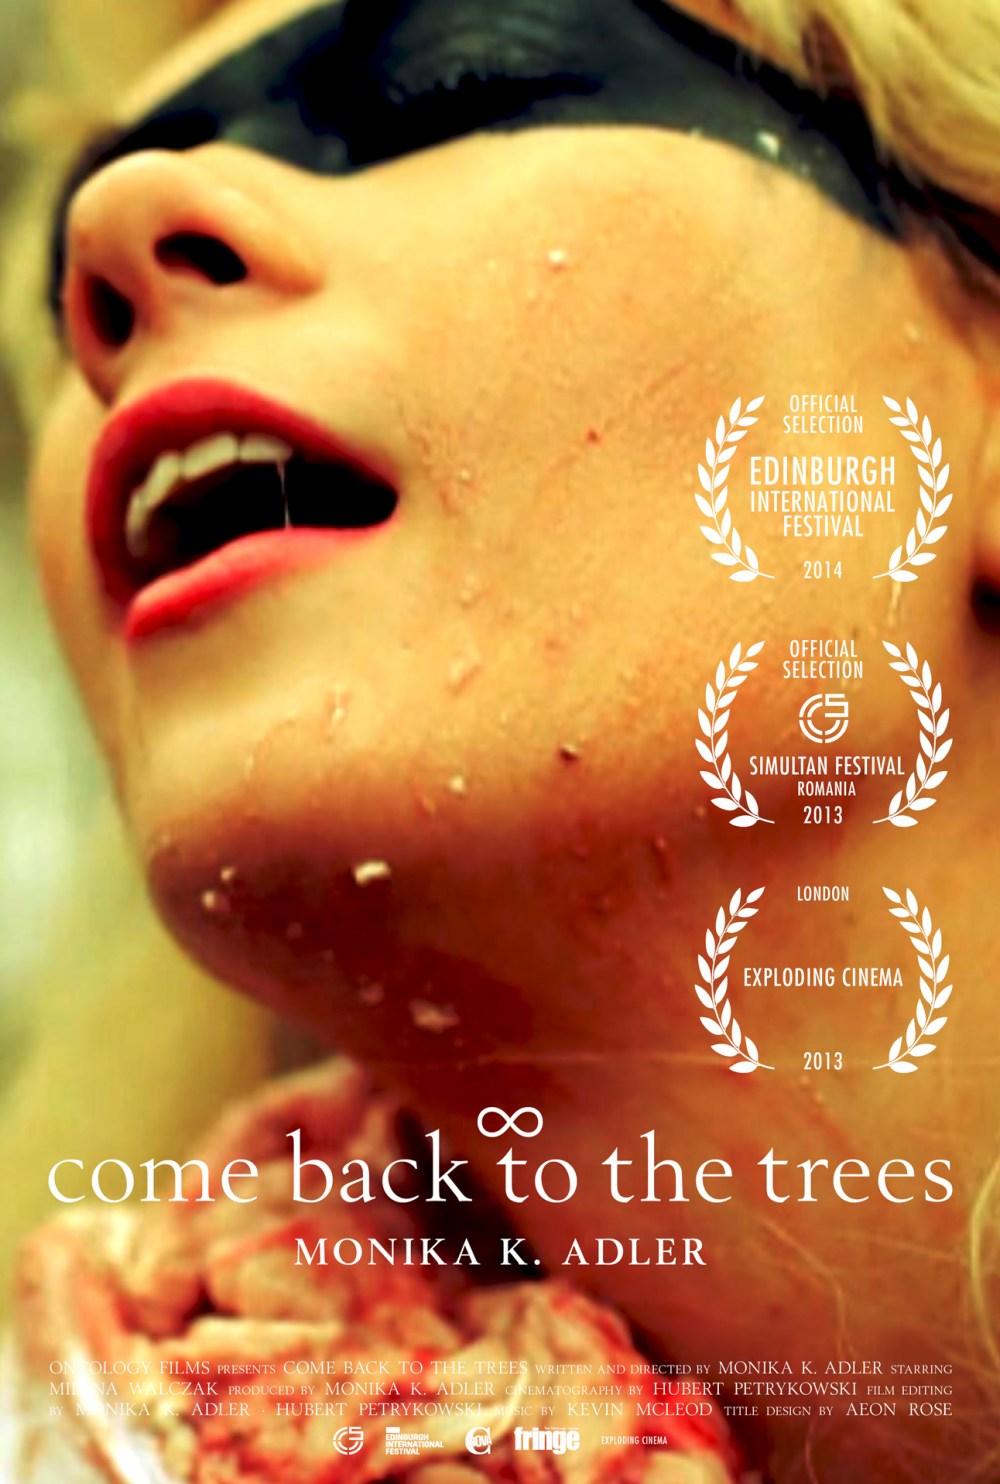 Monika K. Adler, come back to the trees, 2013, film poster, Aeon Rose